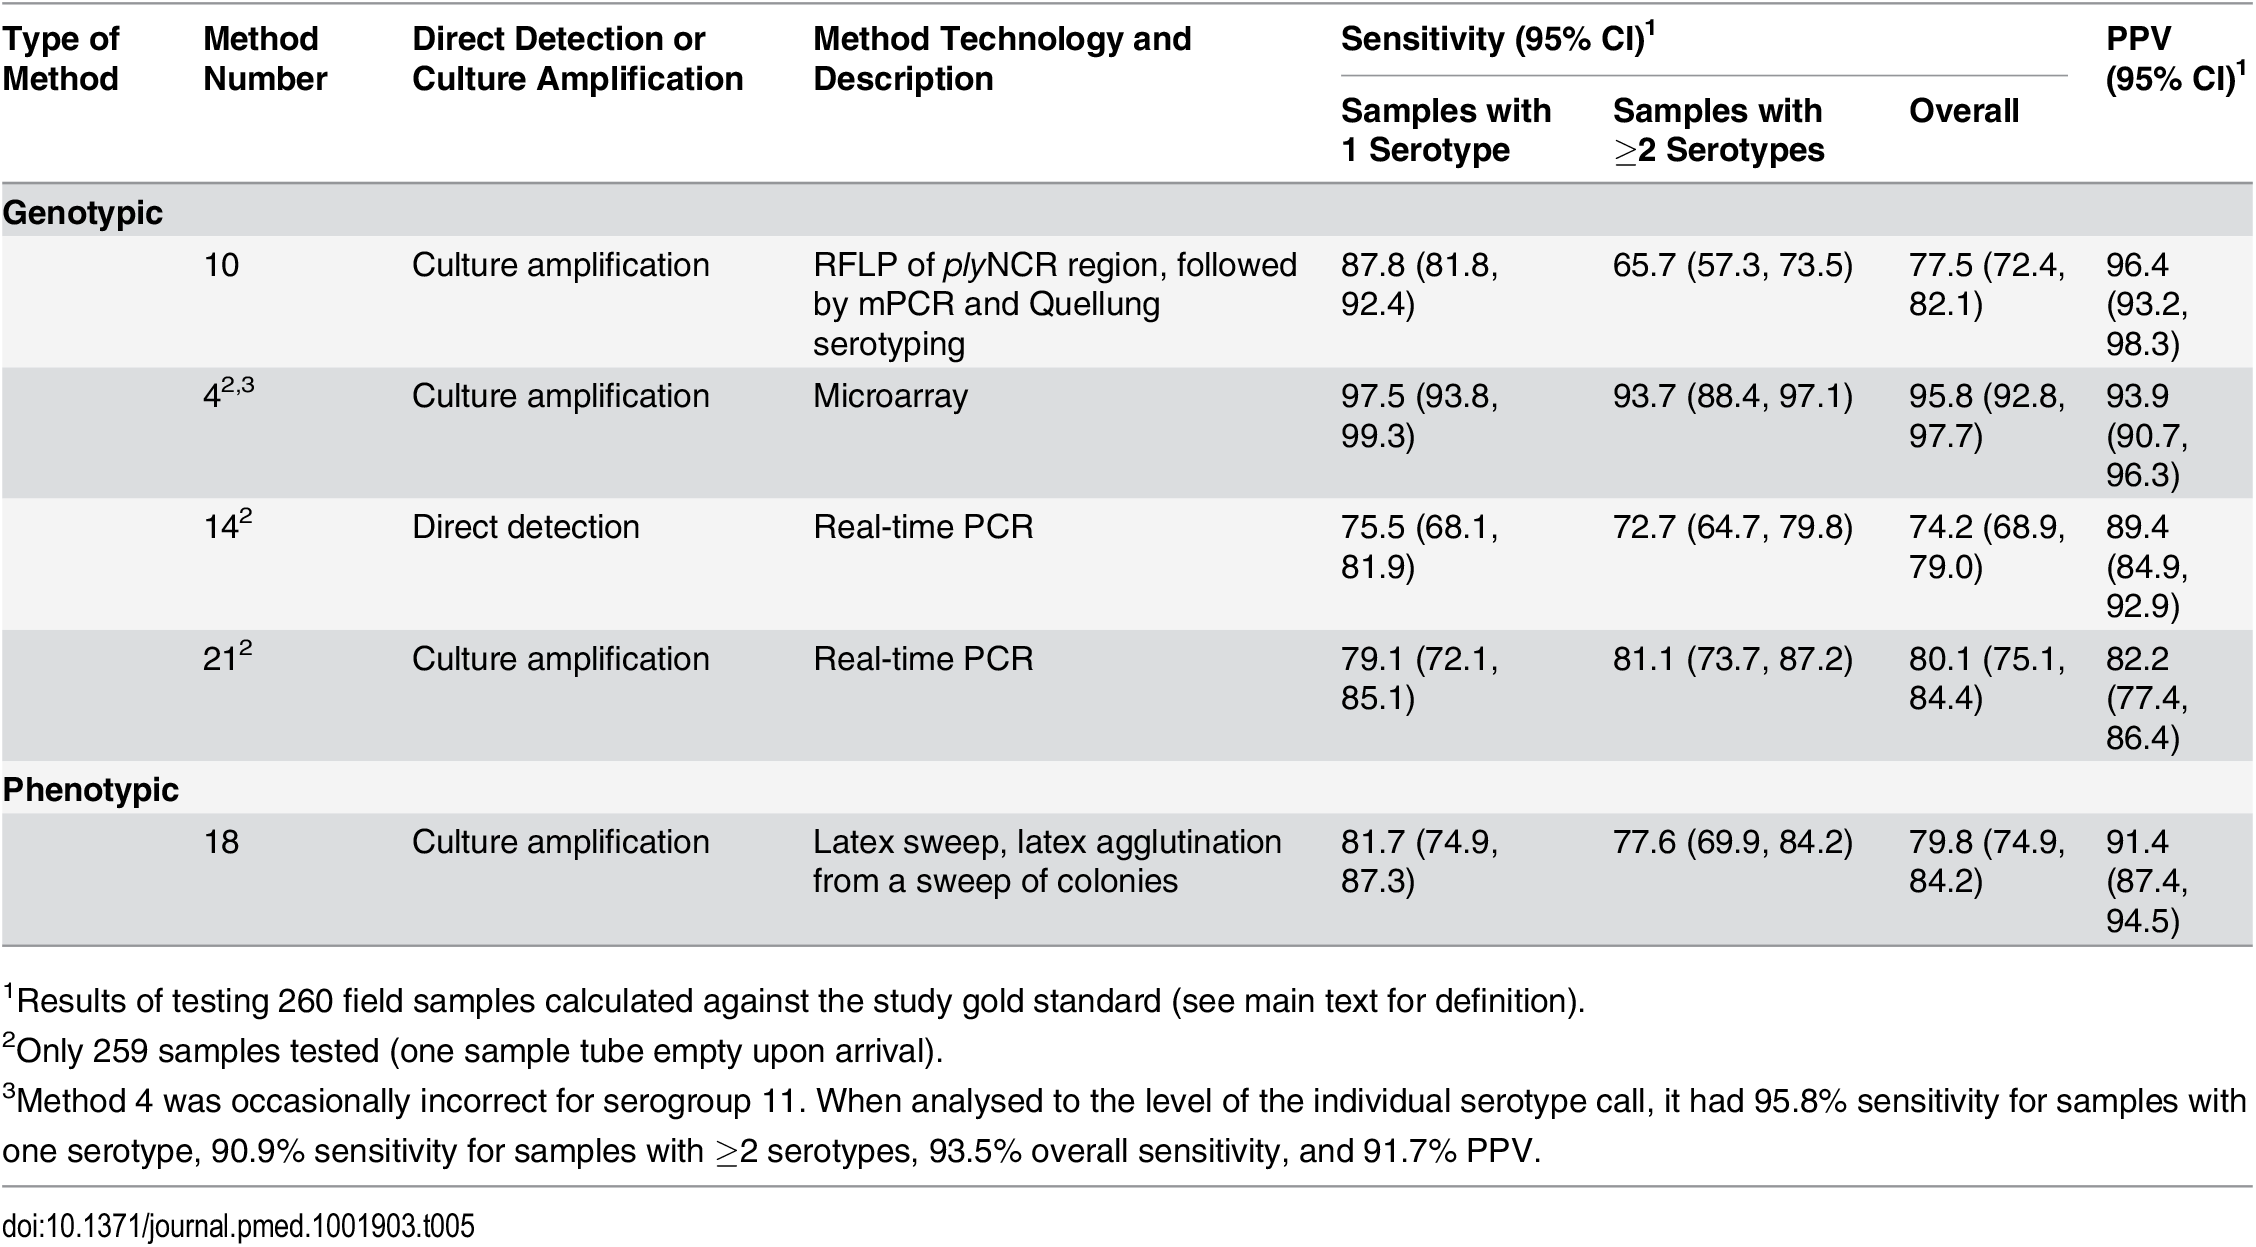 Performance of alternate serotyping methods when testing field samples.